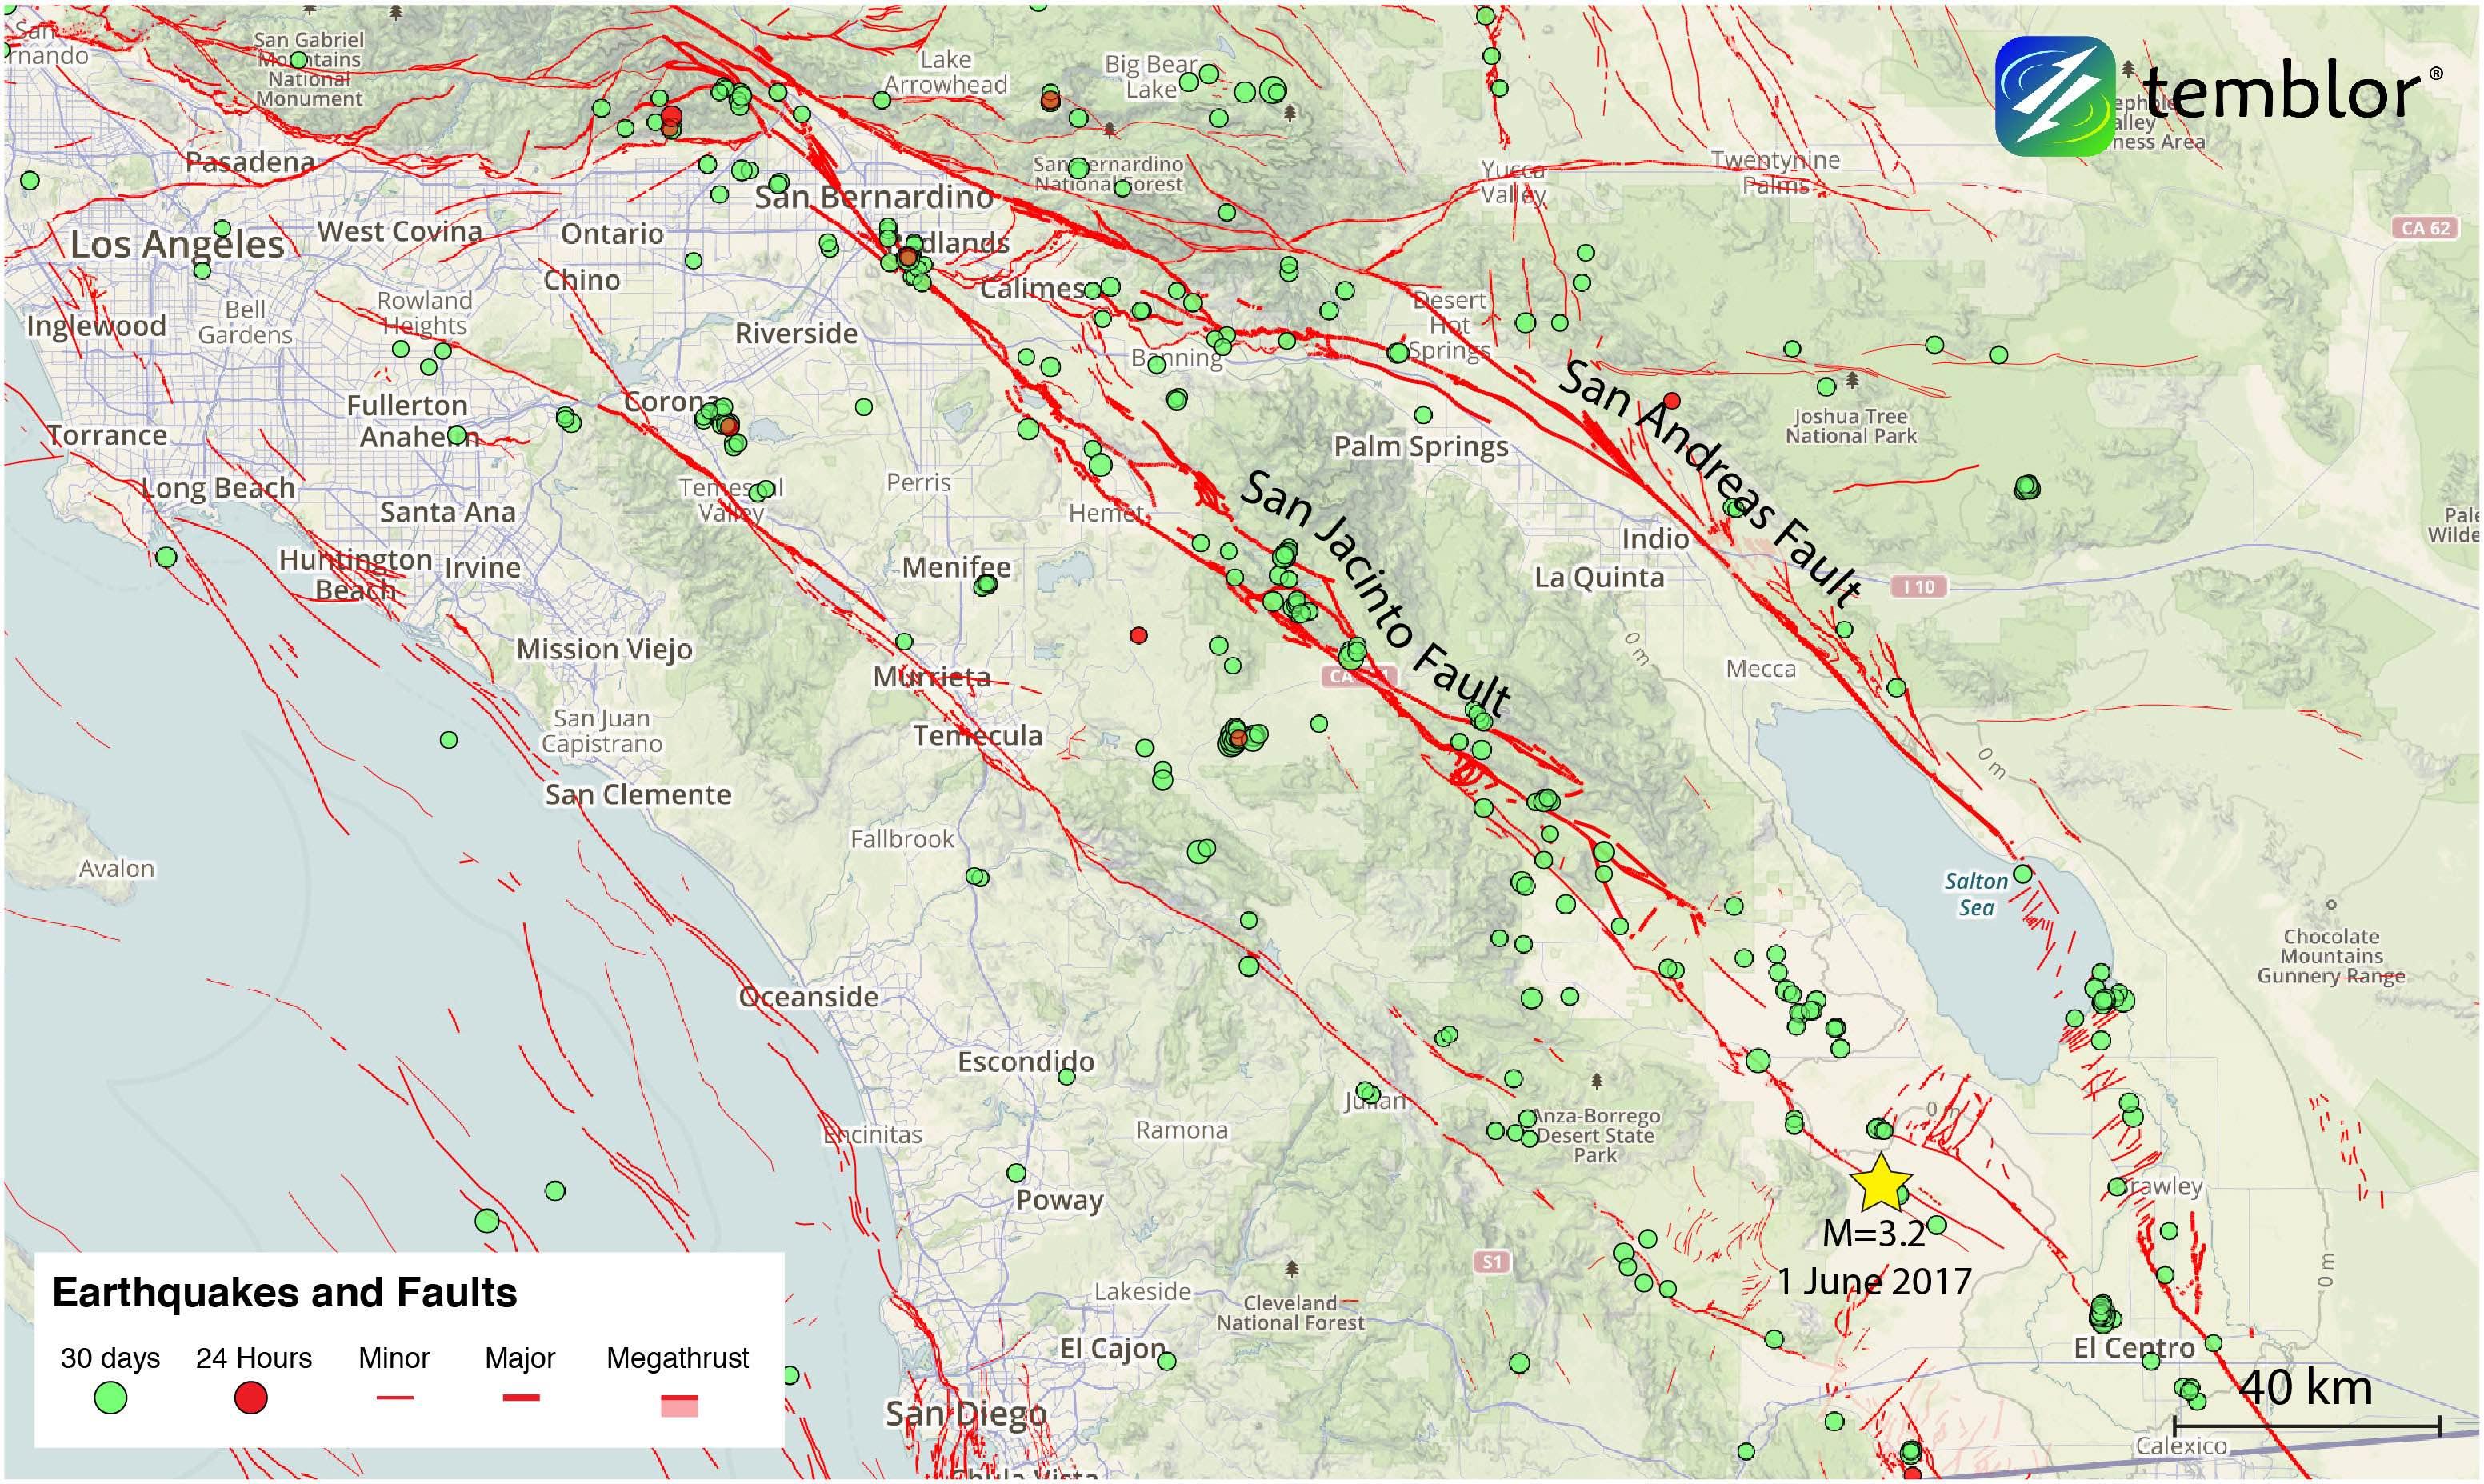 San-jancinto-fault-san-andreas-fault